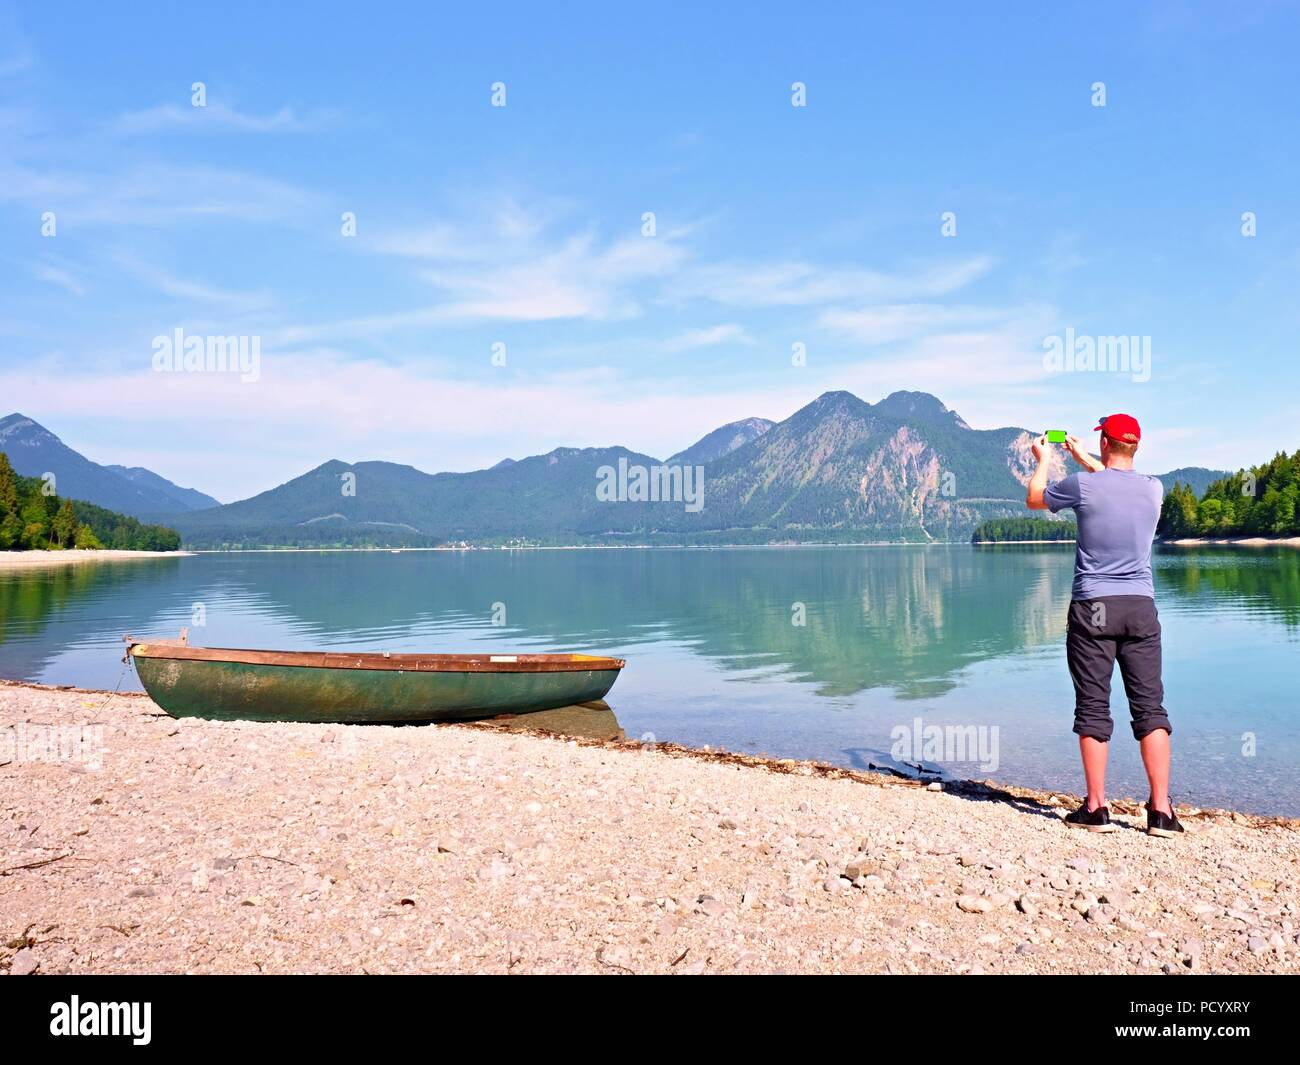 Man hiker is taking photo of ship at mountain lake shore. Silhouette at fishing paddle boat at lake coast. - Stock Image